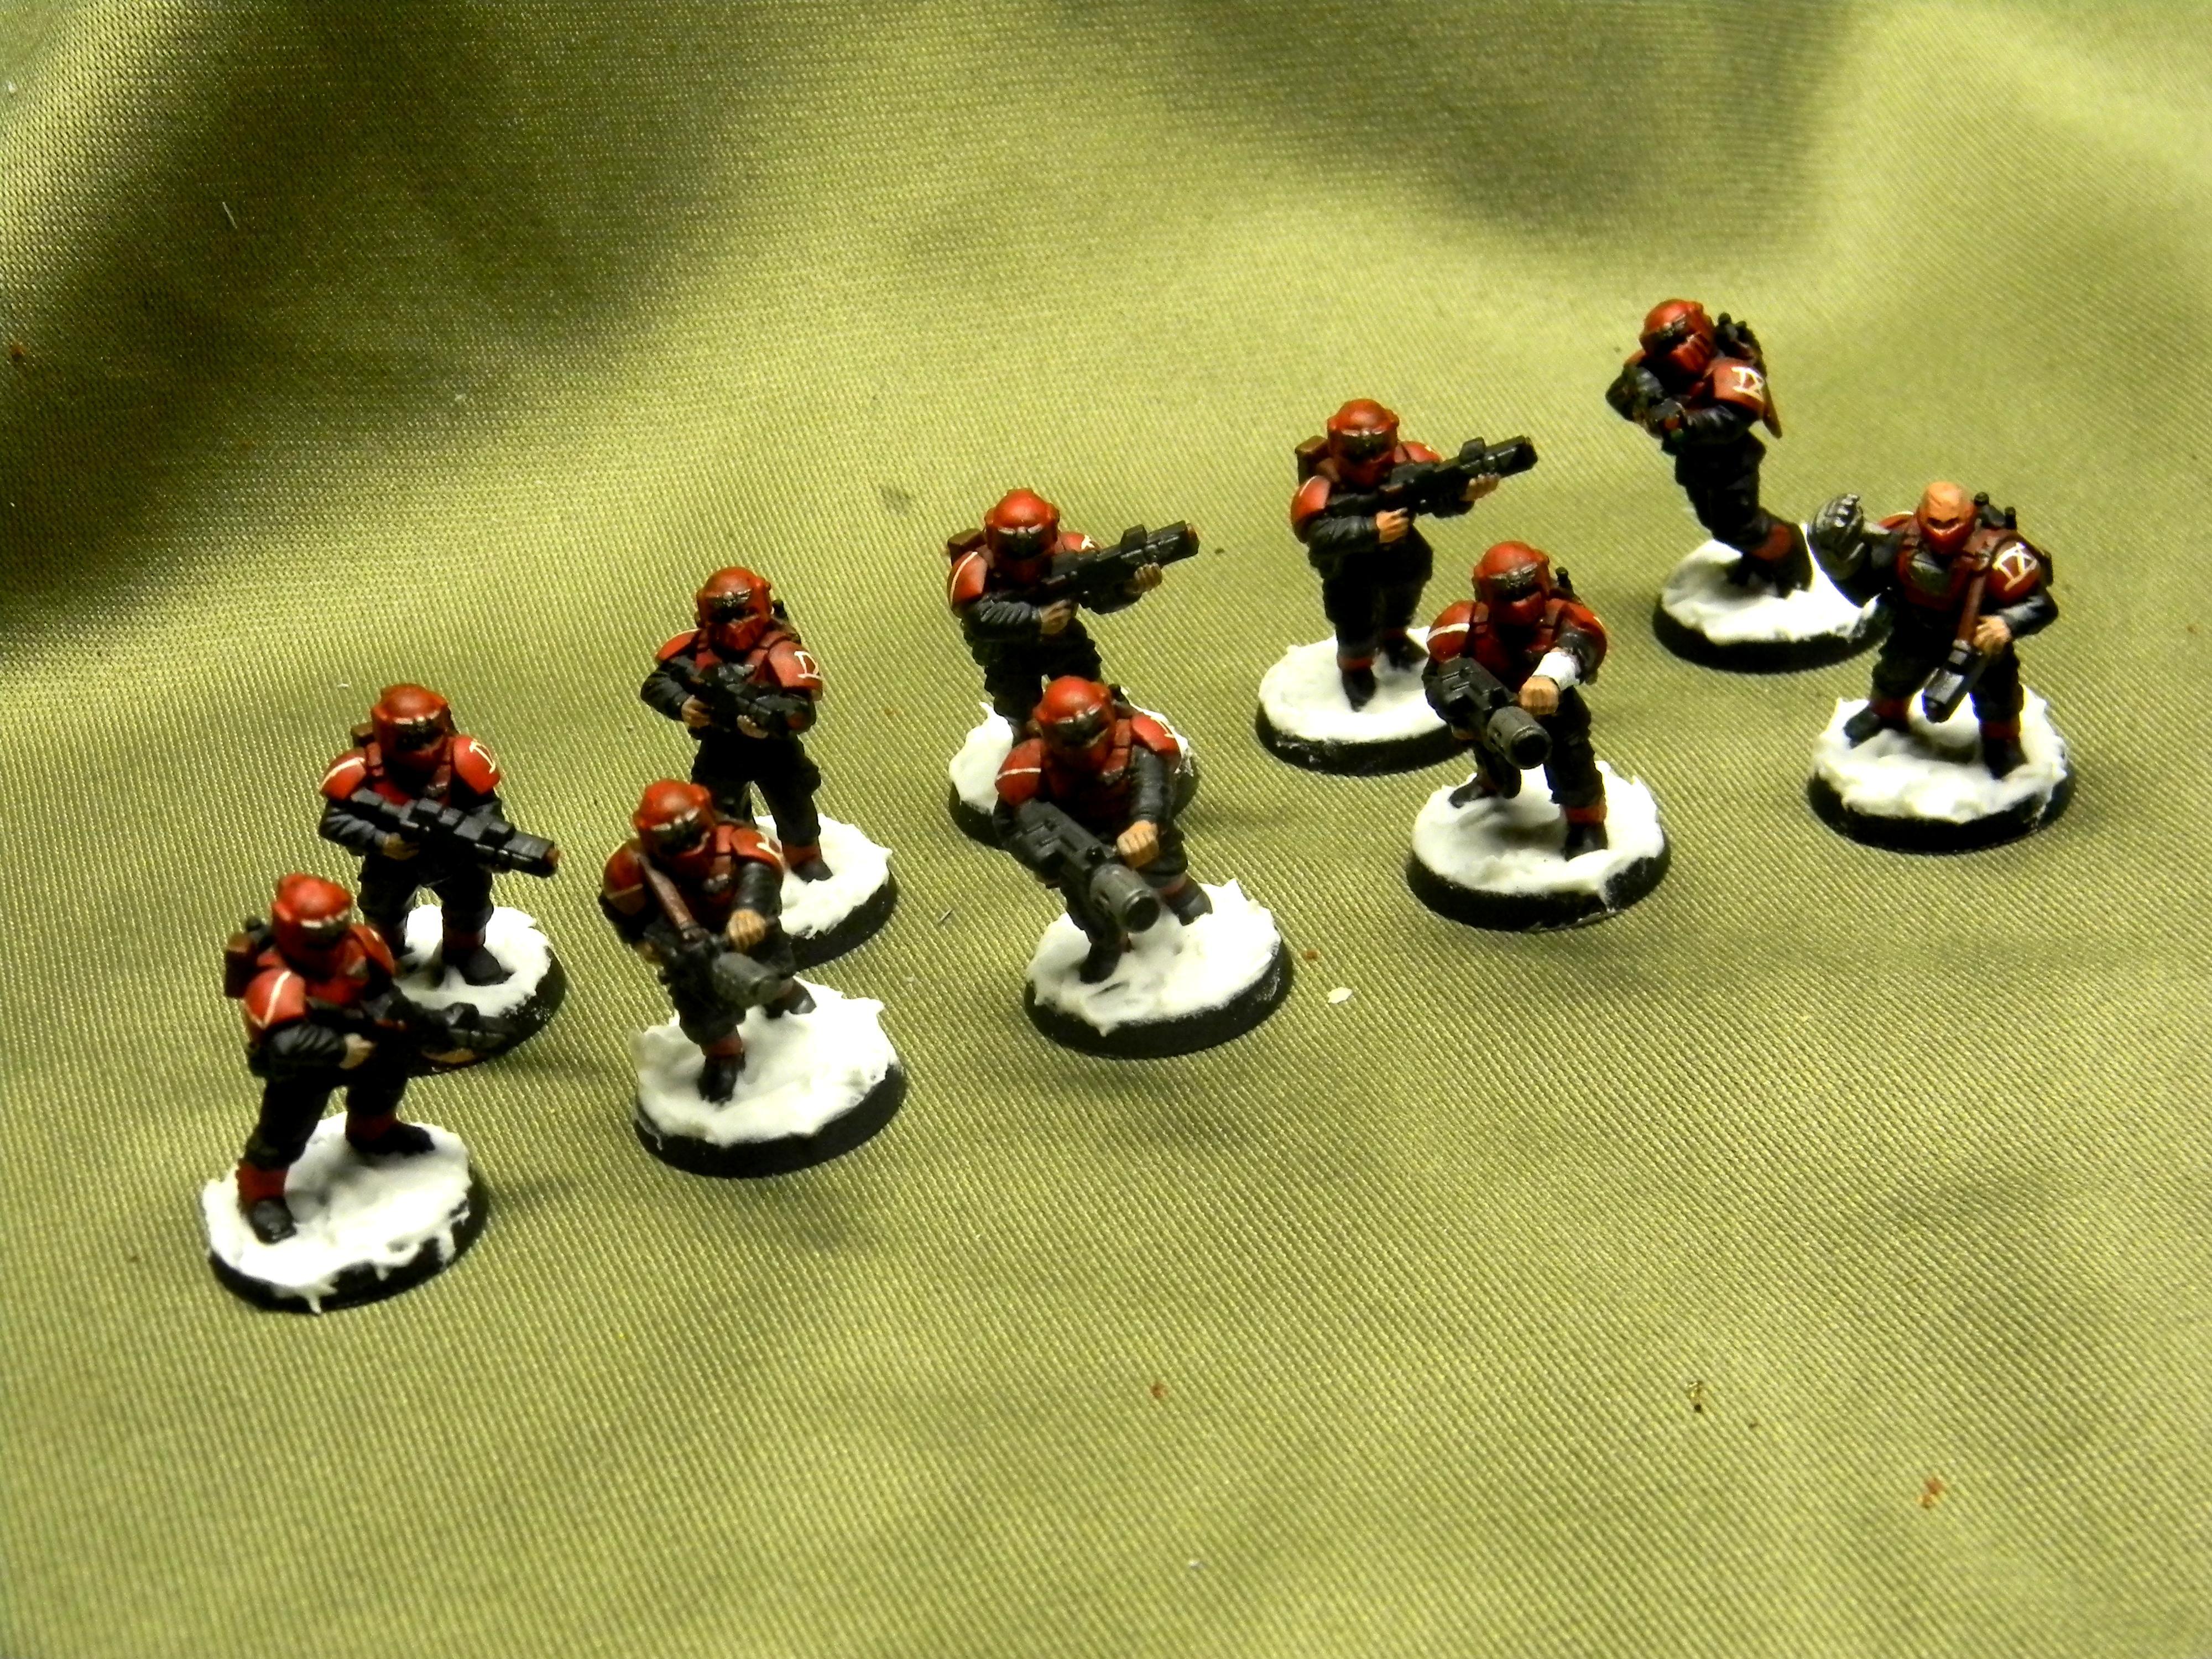 Armor, Cadians, Carapace, Guardsman 9th Cadian Legion, Imperial Guard, Meltagun, Power Fist, Snow, Veteran